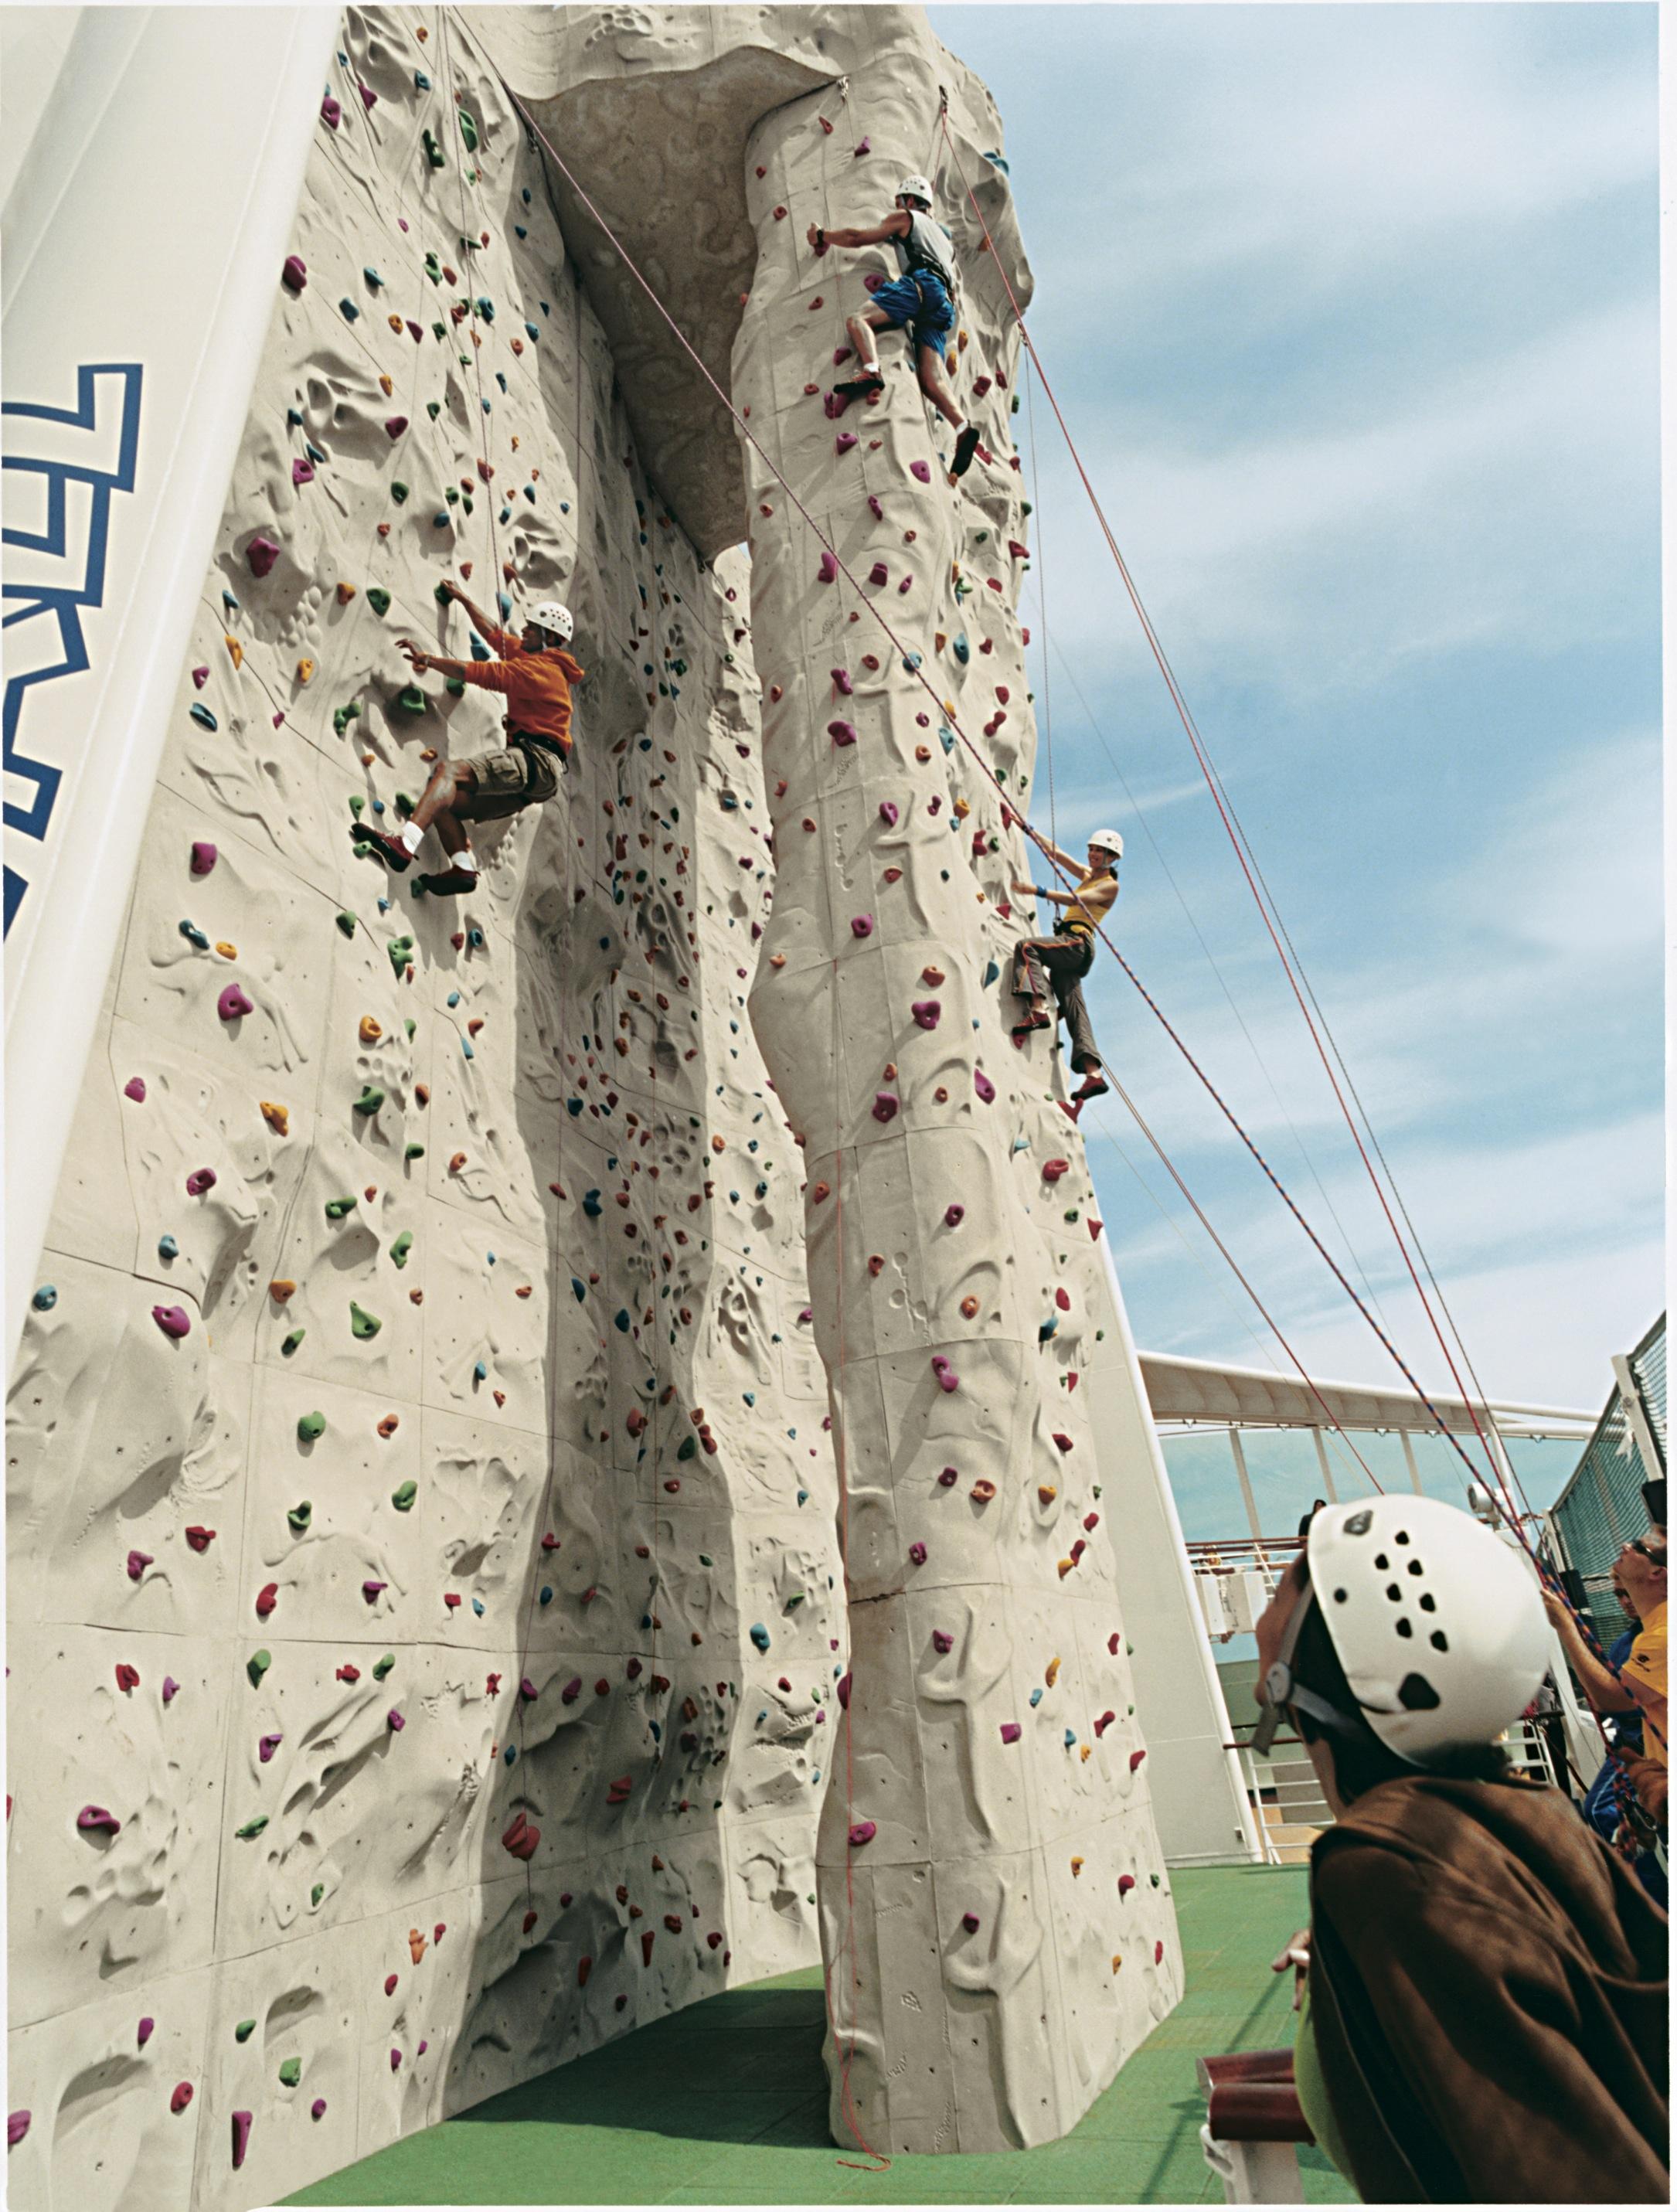 Royal Caribbean International Freedom of the Seas Exterior Rock Climbers 6.jpeg